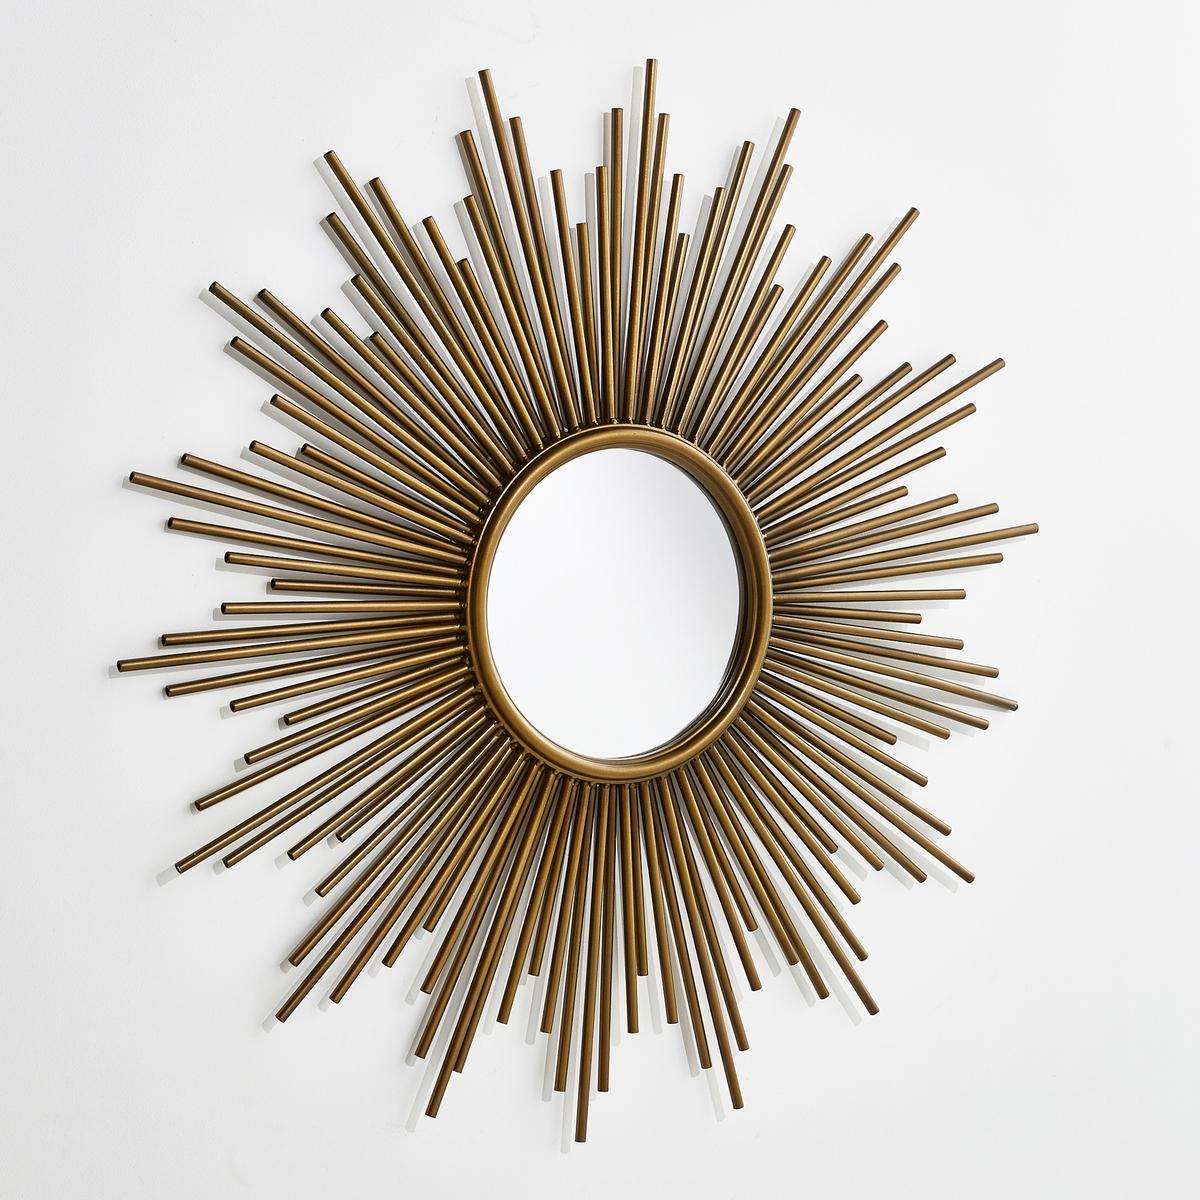 Зеркало в форме солнца, диаметр 80 см, Soledad зеркало круглое ø60 см